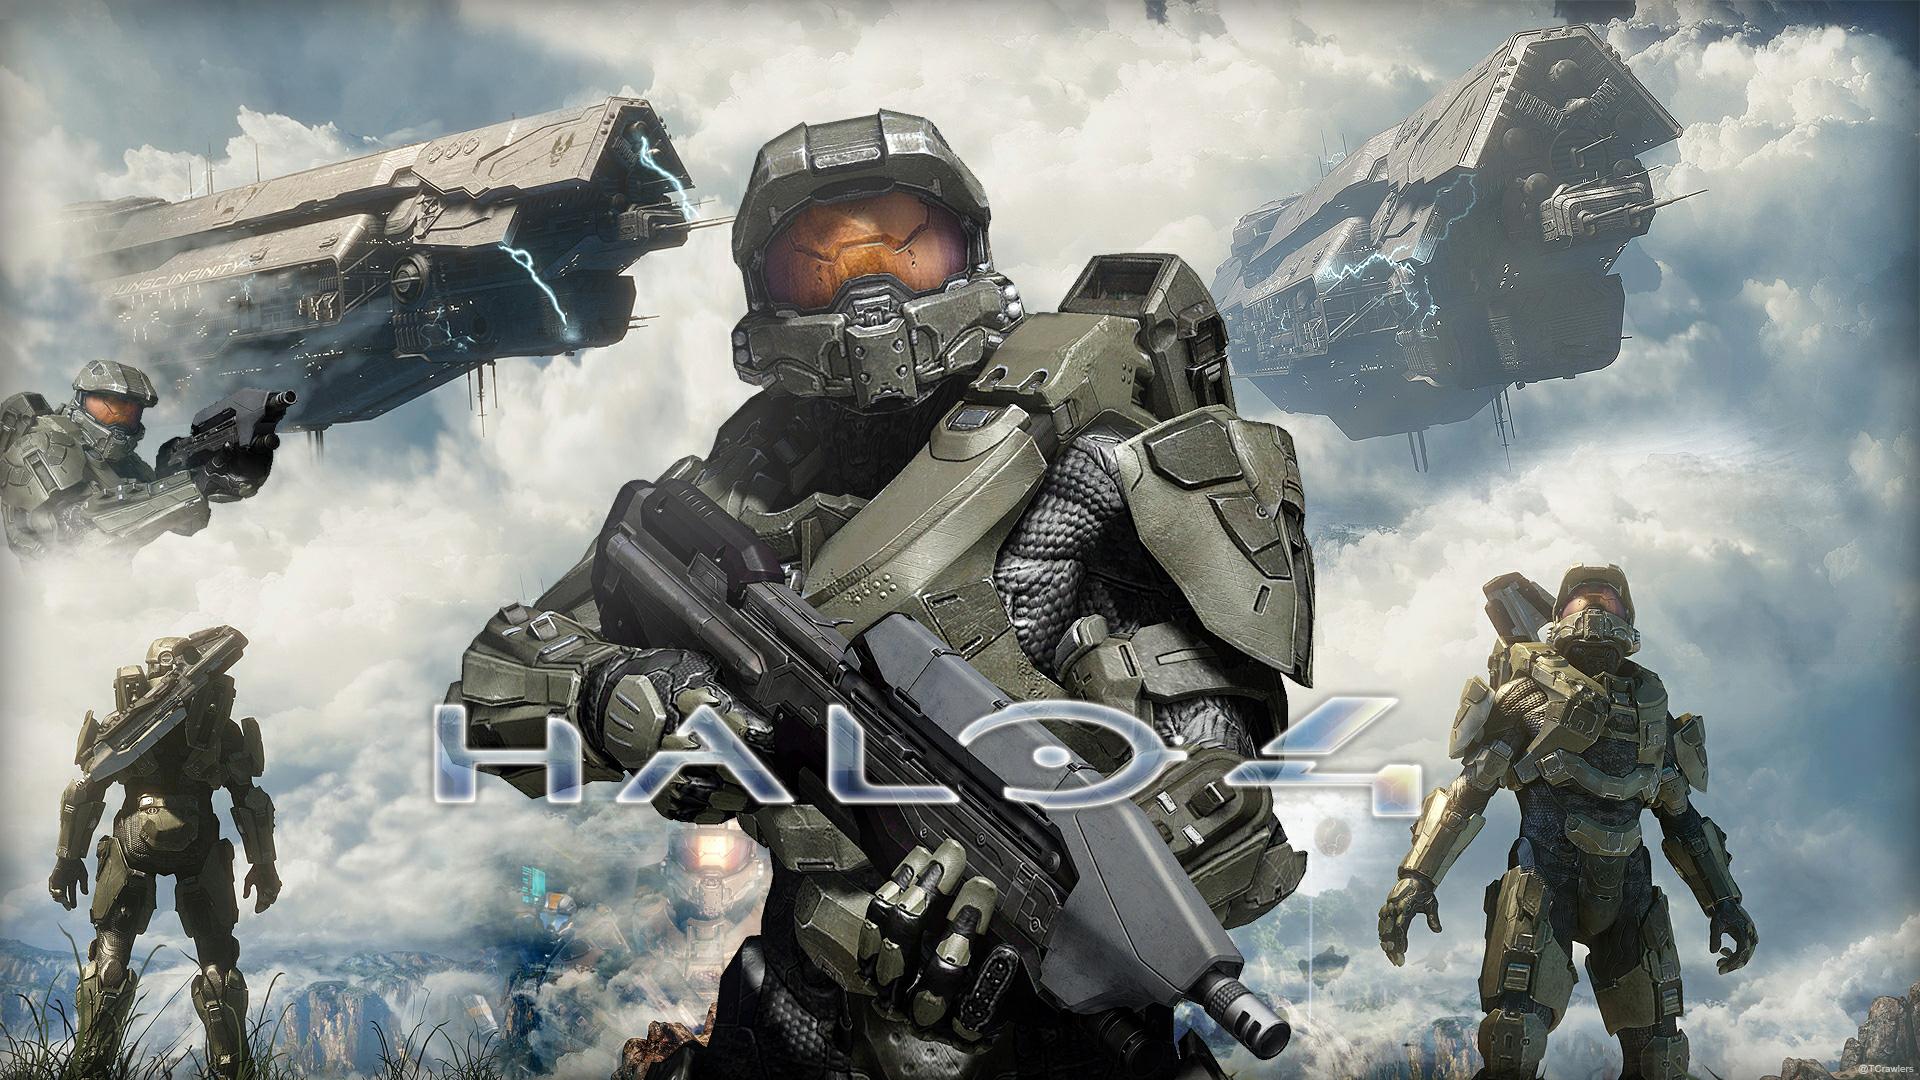 Halo 4 wallpaper hd   SF Wallpaper 1920x1080